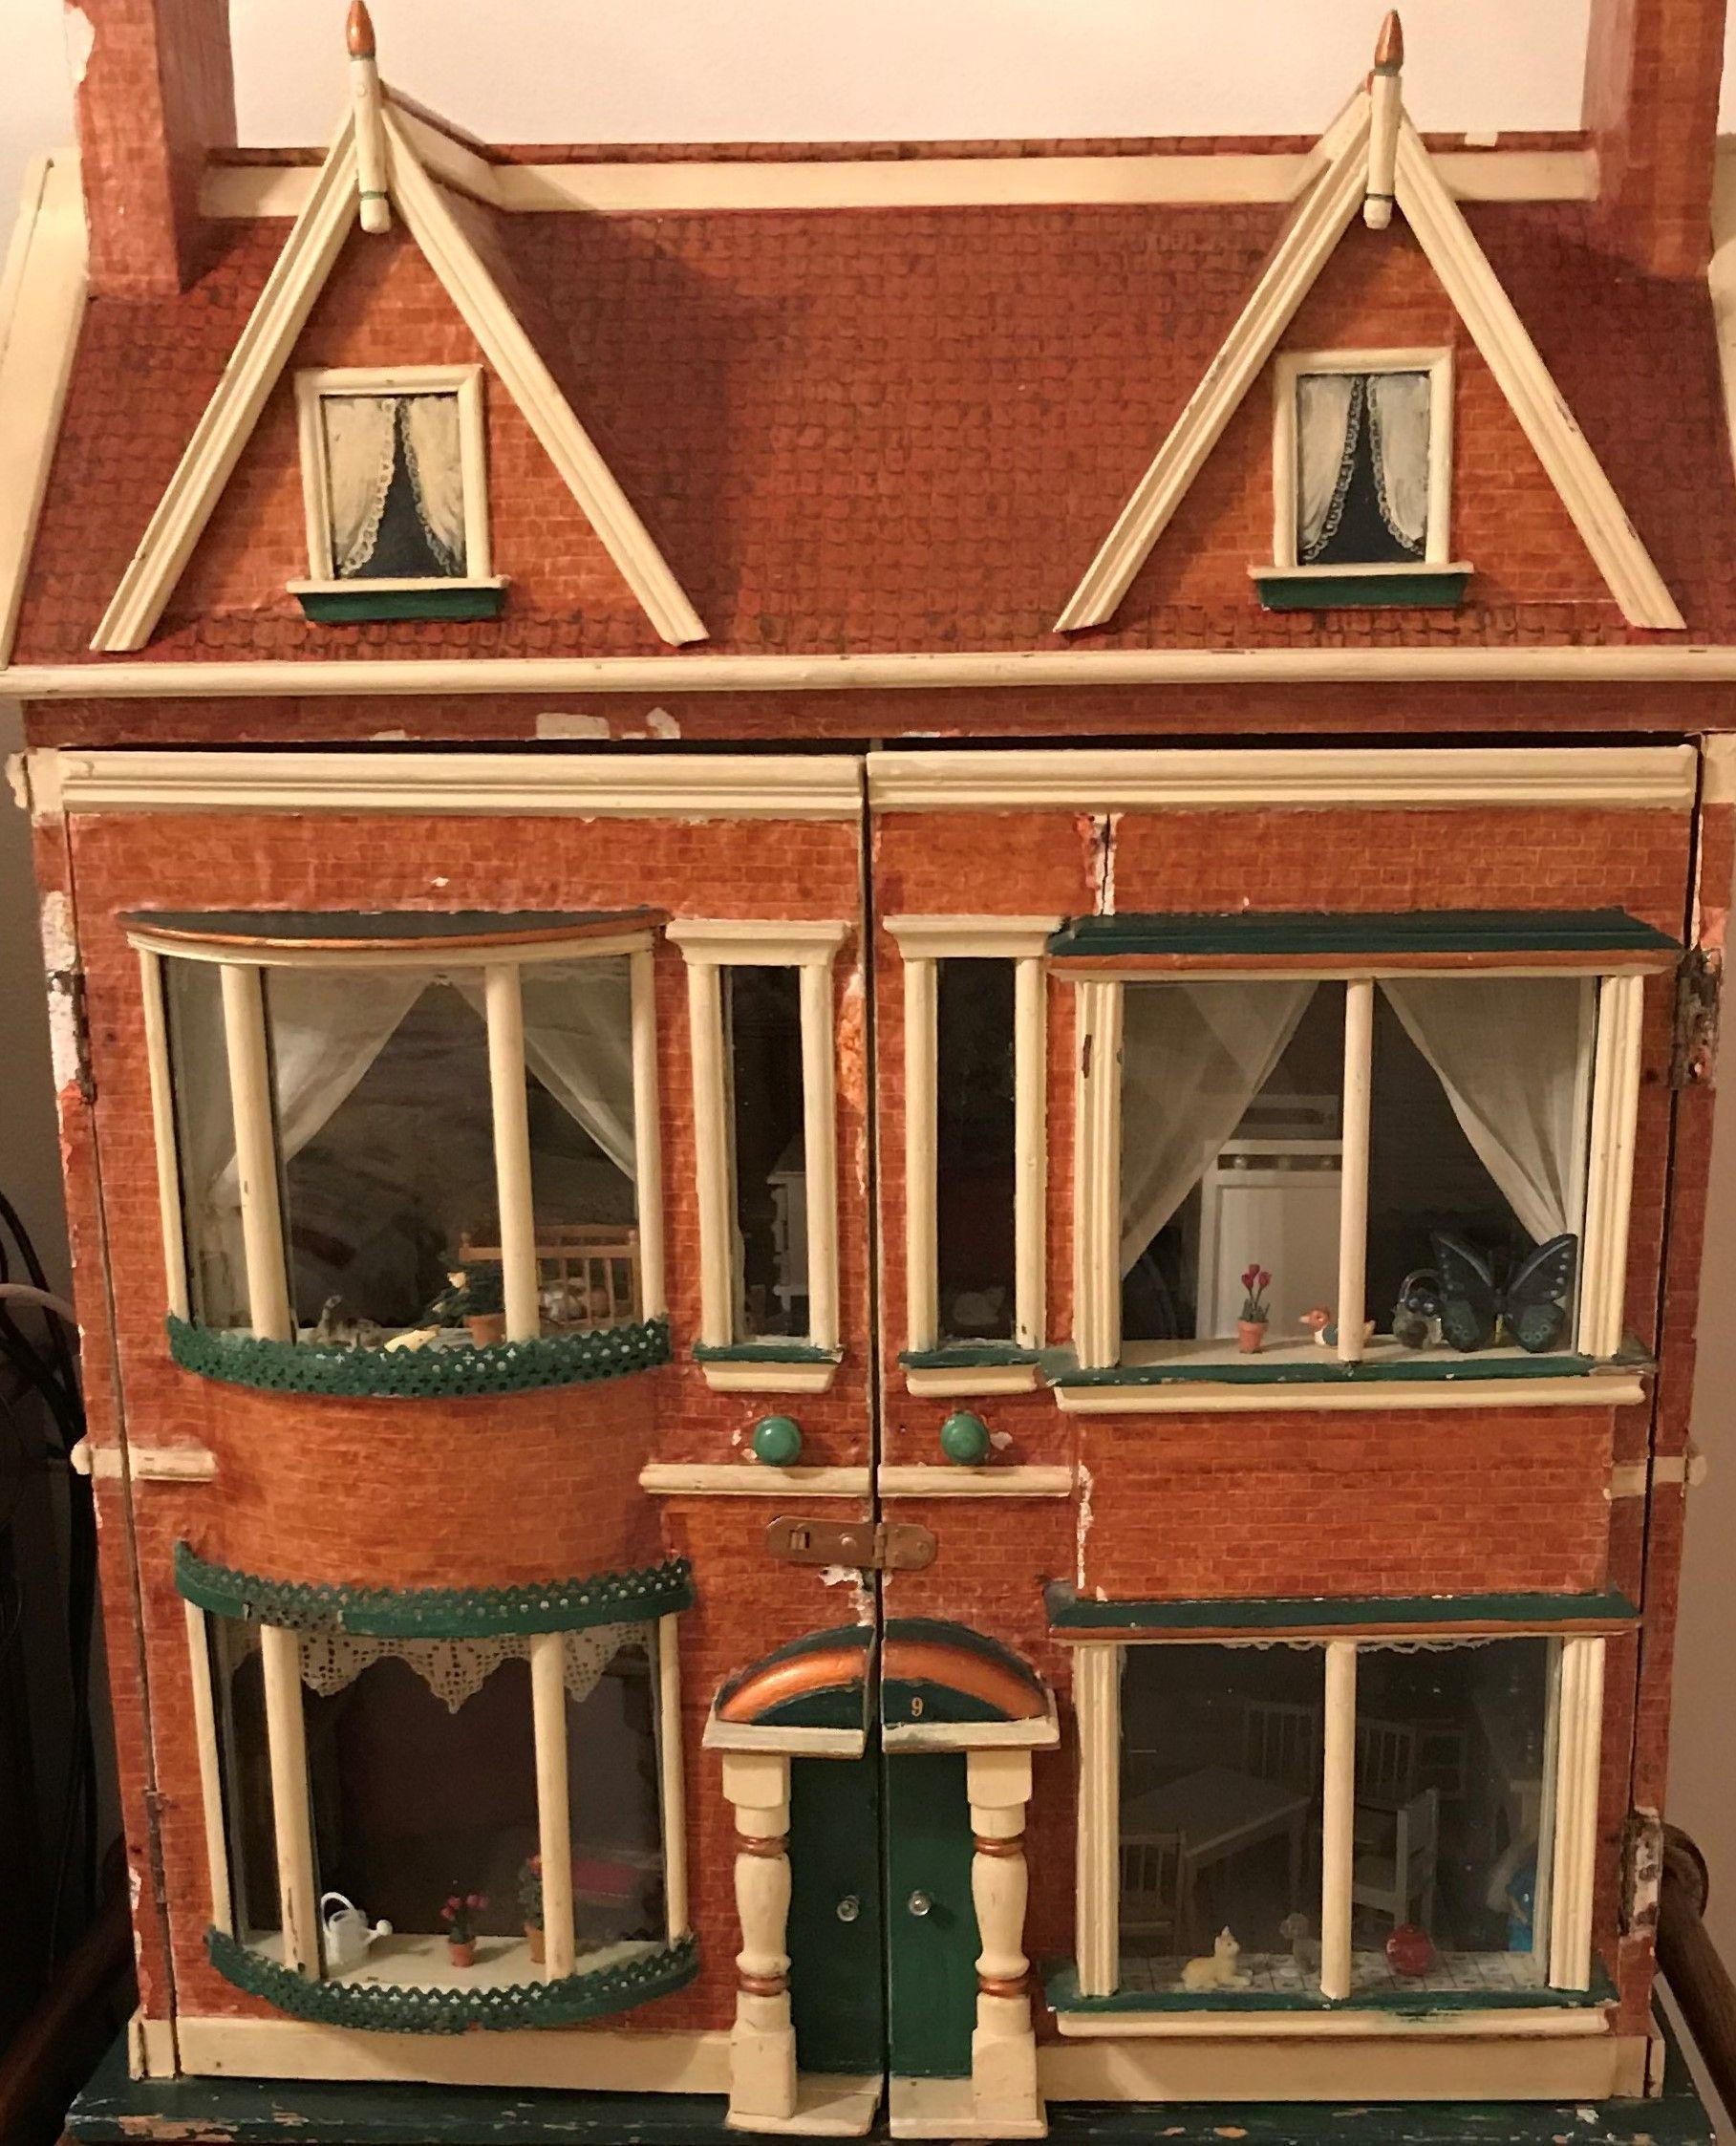 Antique 1890 Dollhouse Victoriandollhouse For Sale Philadelphia Victorian Dollhouse 1890 37 Ta Doll Houses For Sale Doll House Wooden Dolls House Furniture